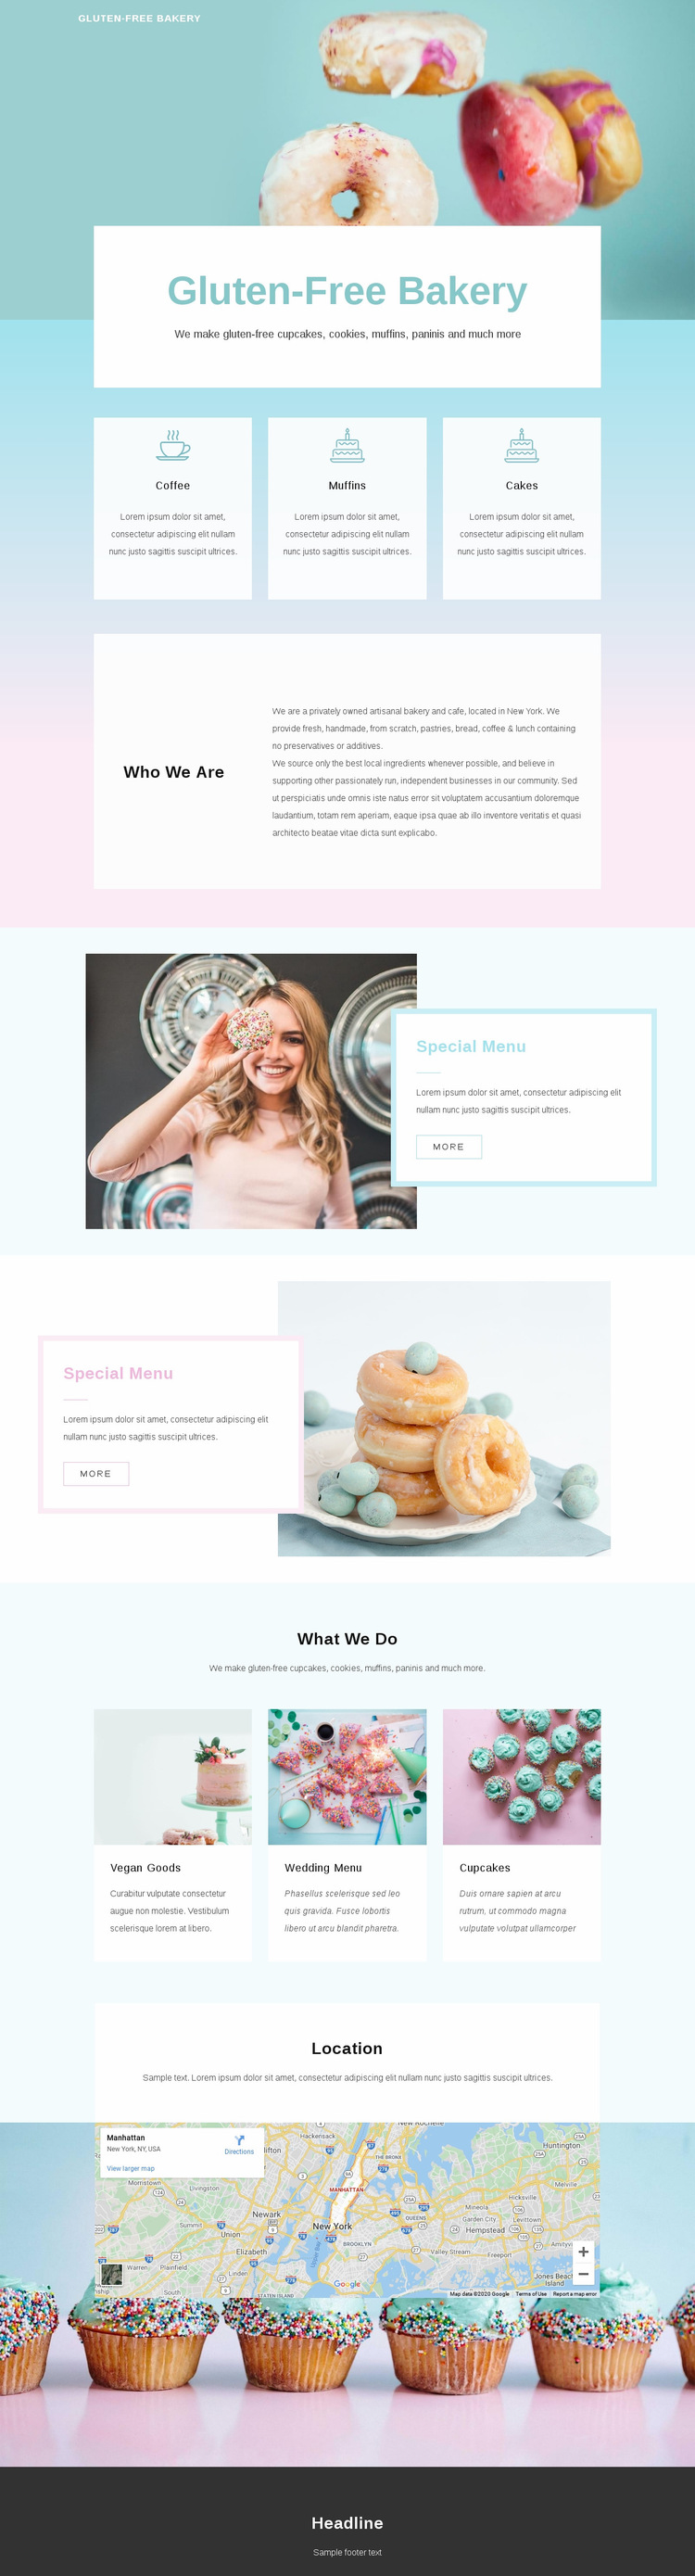 Gluten-Free Backery Web Page Design